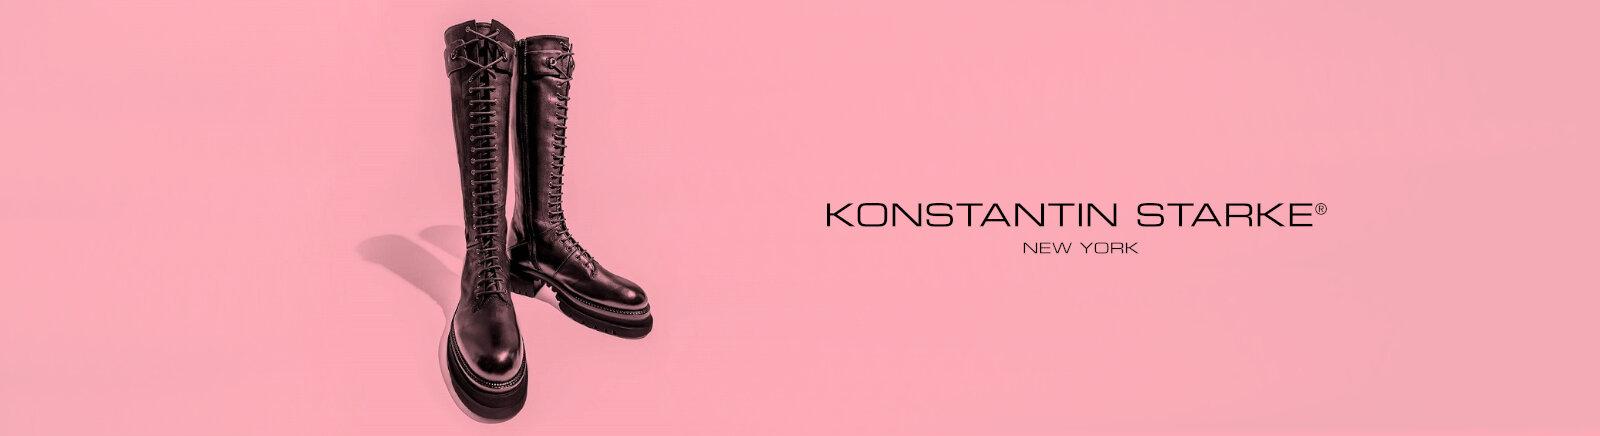 Juppen: Konstantin Starke Western Boots für Damen online shoppen